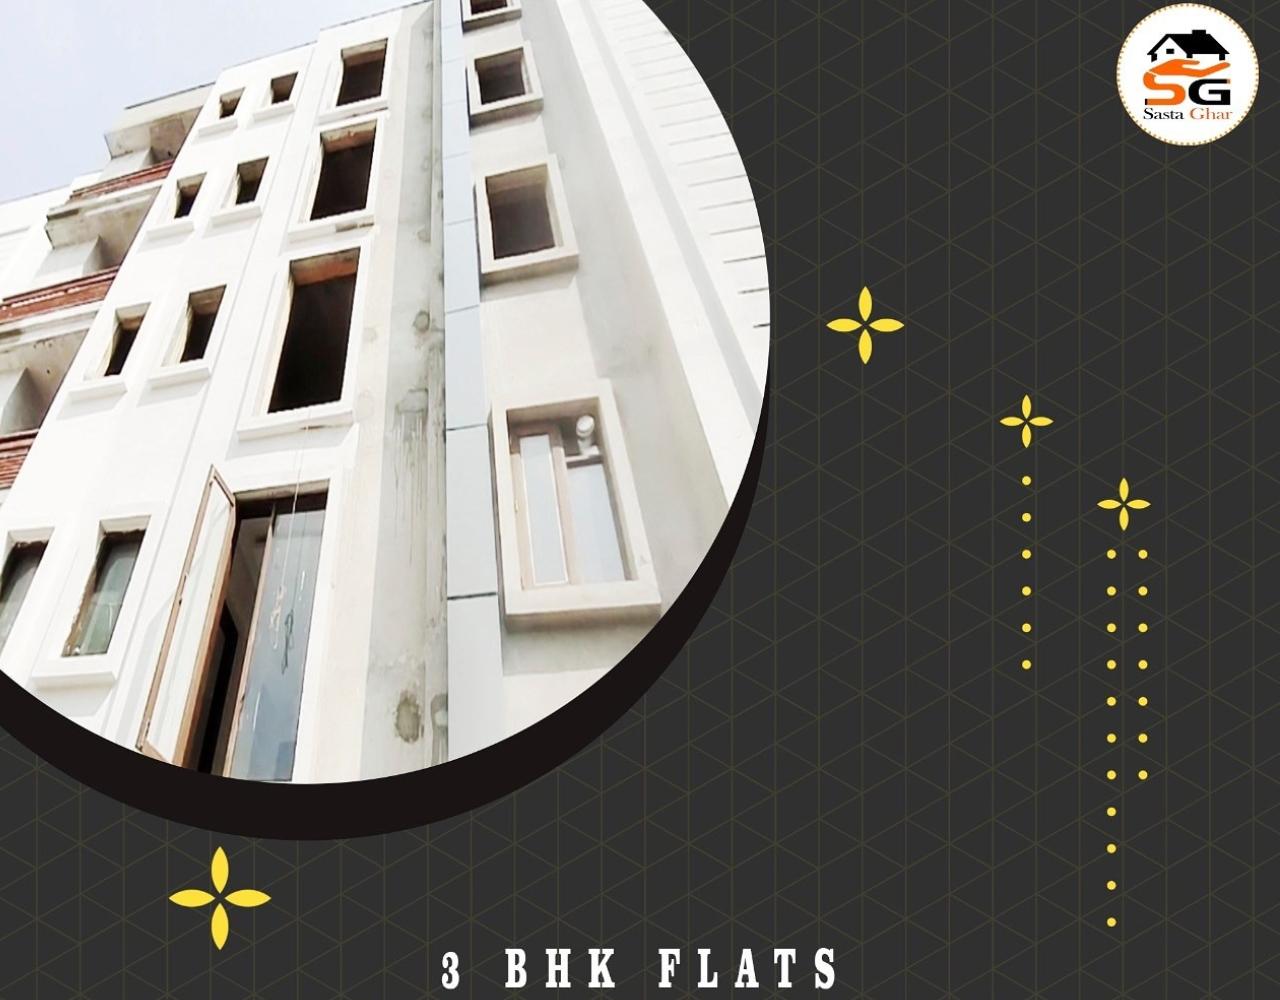 3 BHK Flats In Mandi Image